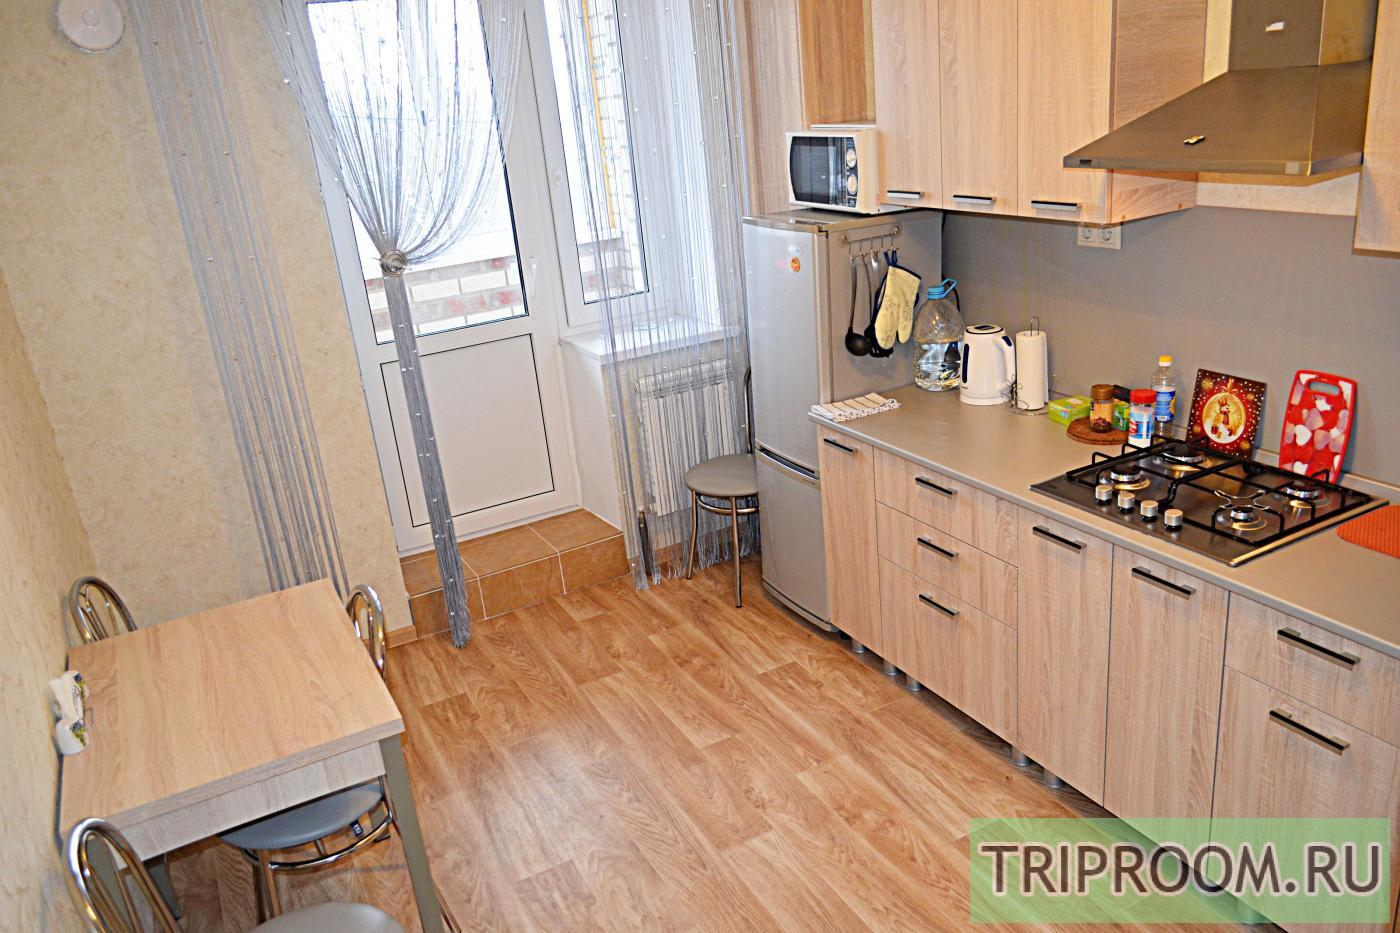 1-комнатная квартира посуточно (вариант № 15487), ул. Брылевка улица, фото № 6